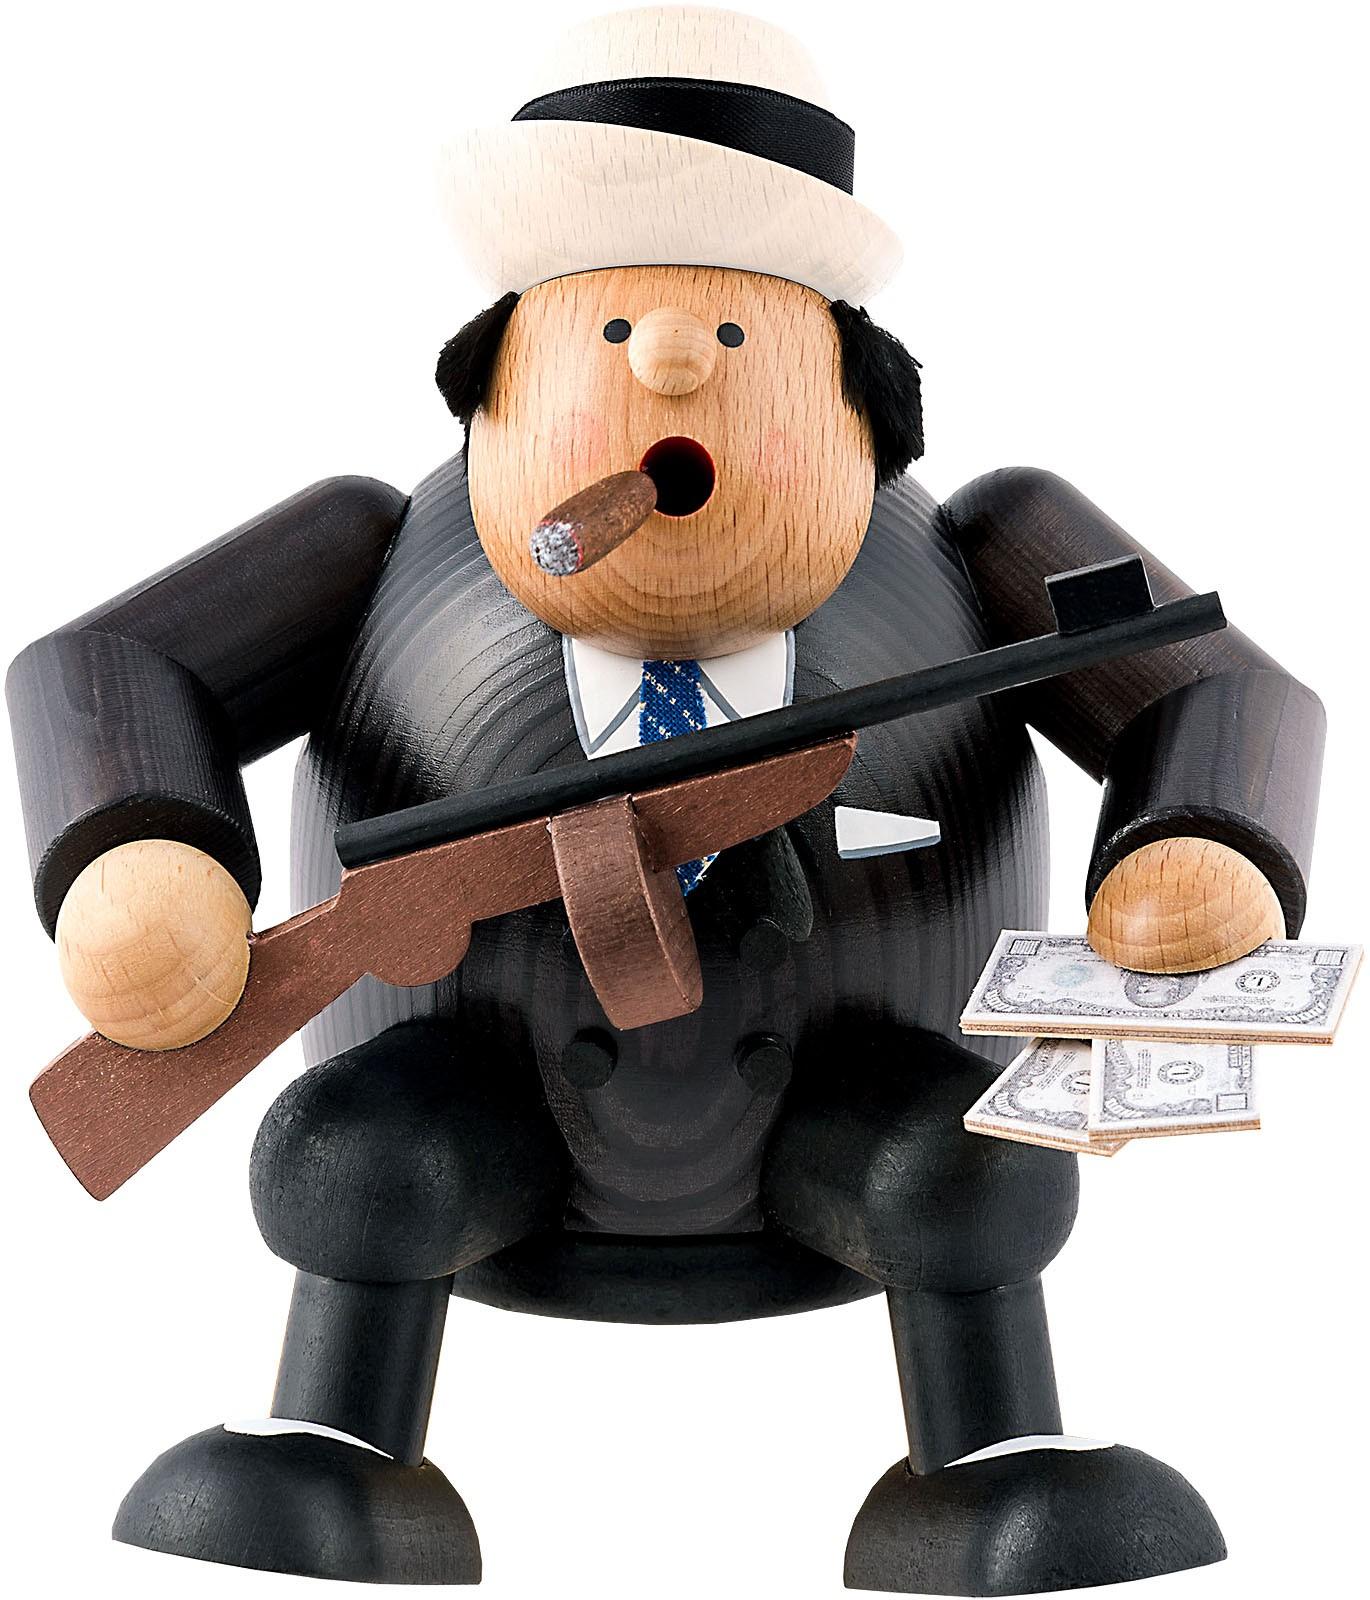 Kantenhocker Al Capone -Die Dicken-